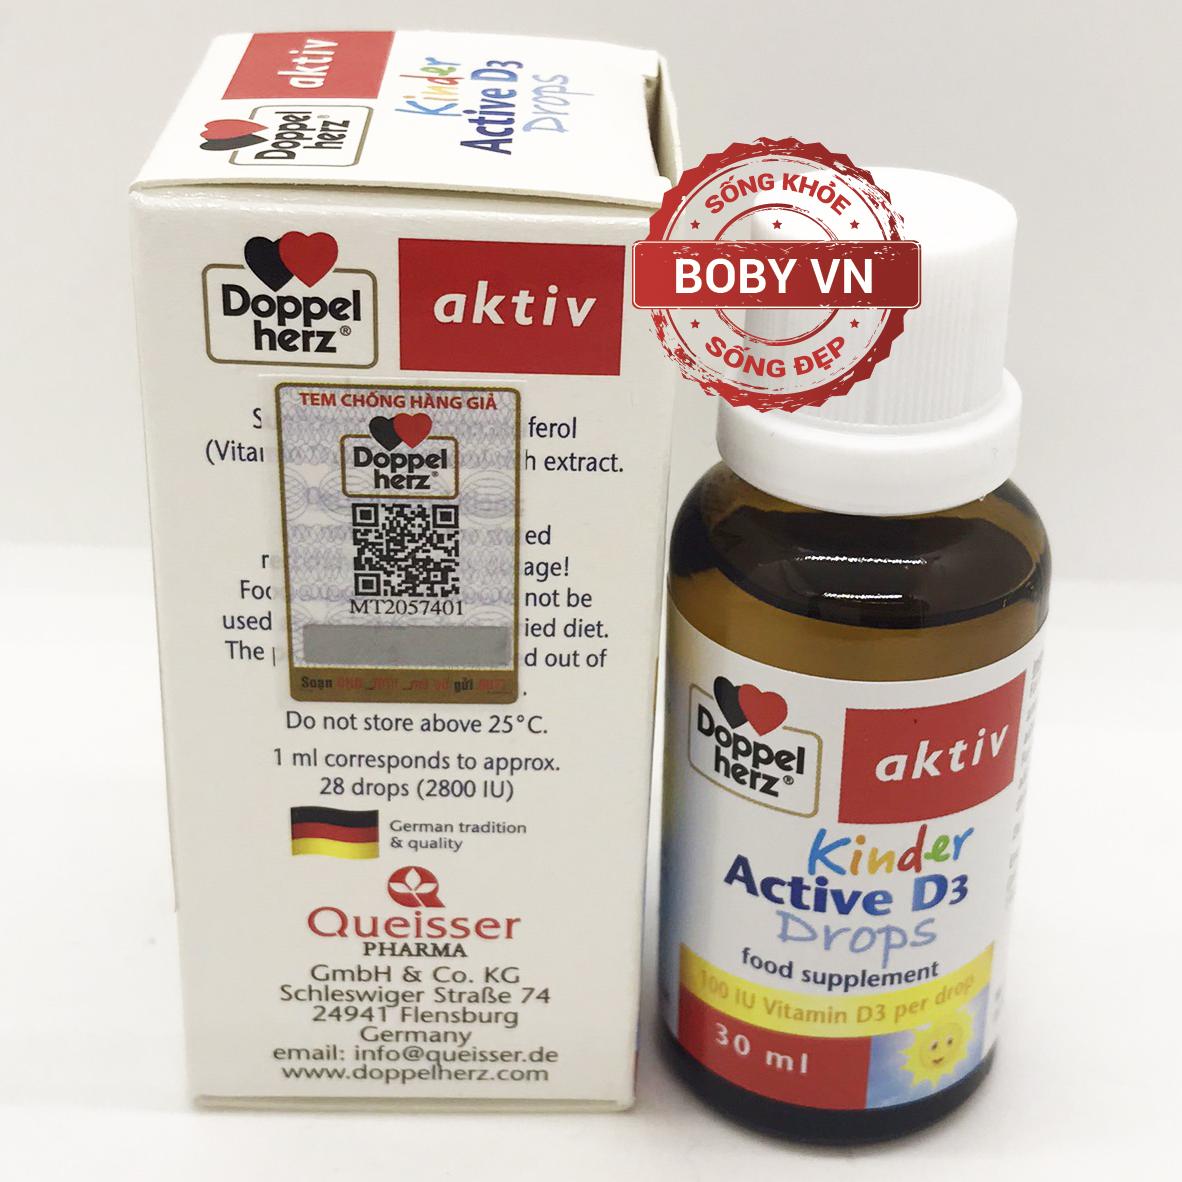 Doppel herz aktiv Kinder Active D3 Drops bổ sung vitamin D3 cho trẻ